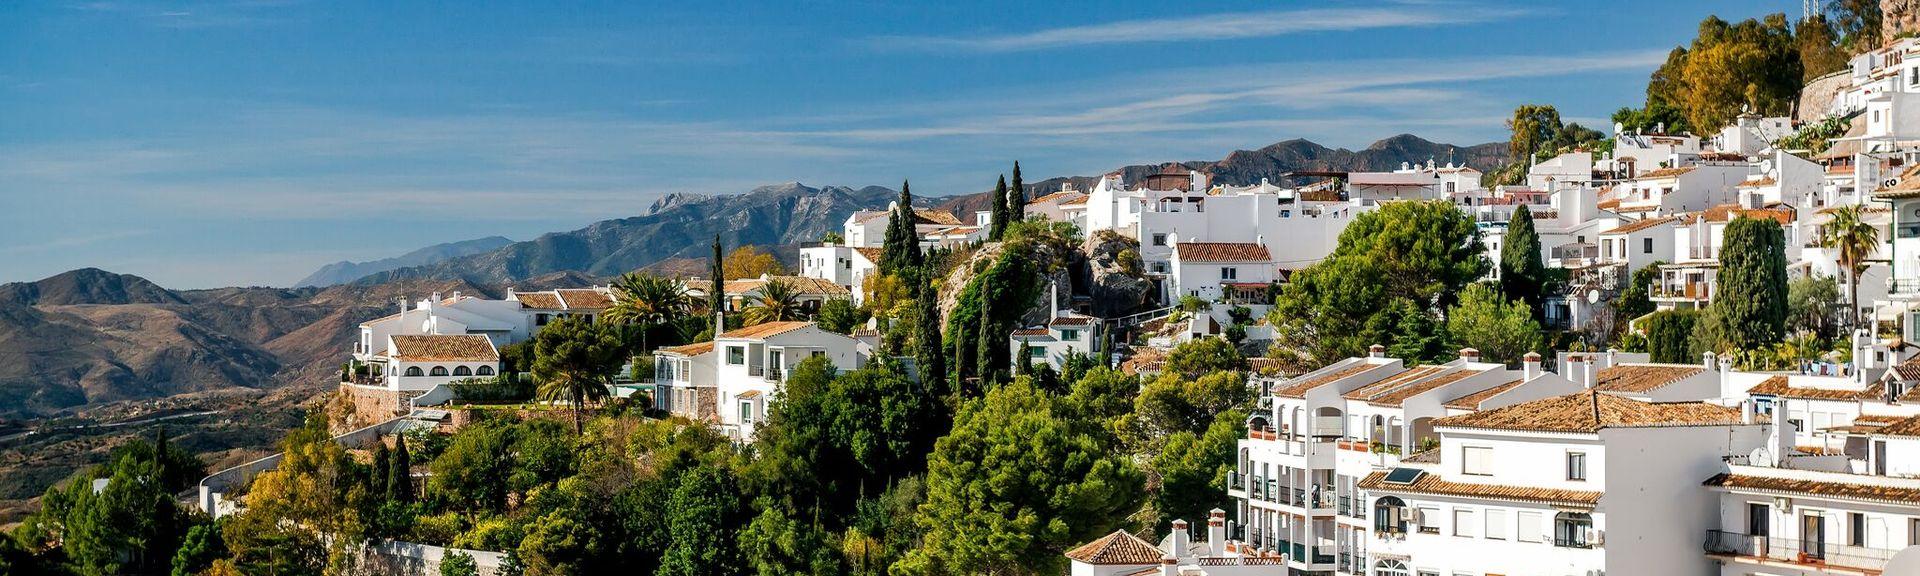 Mijas, Málaga, Spain